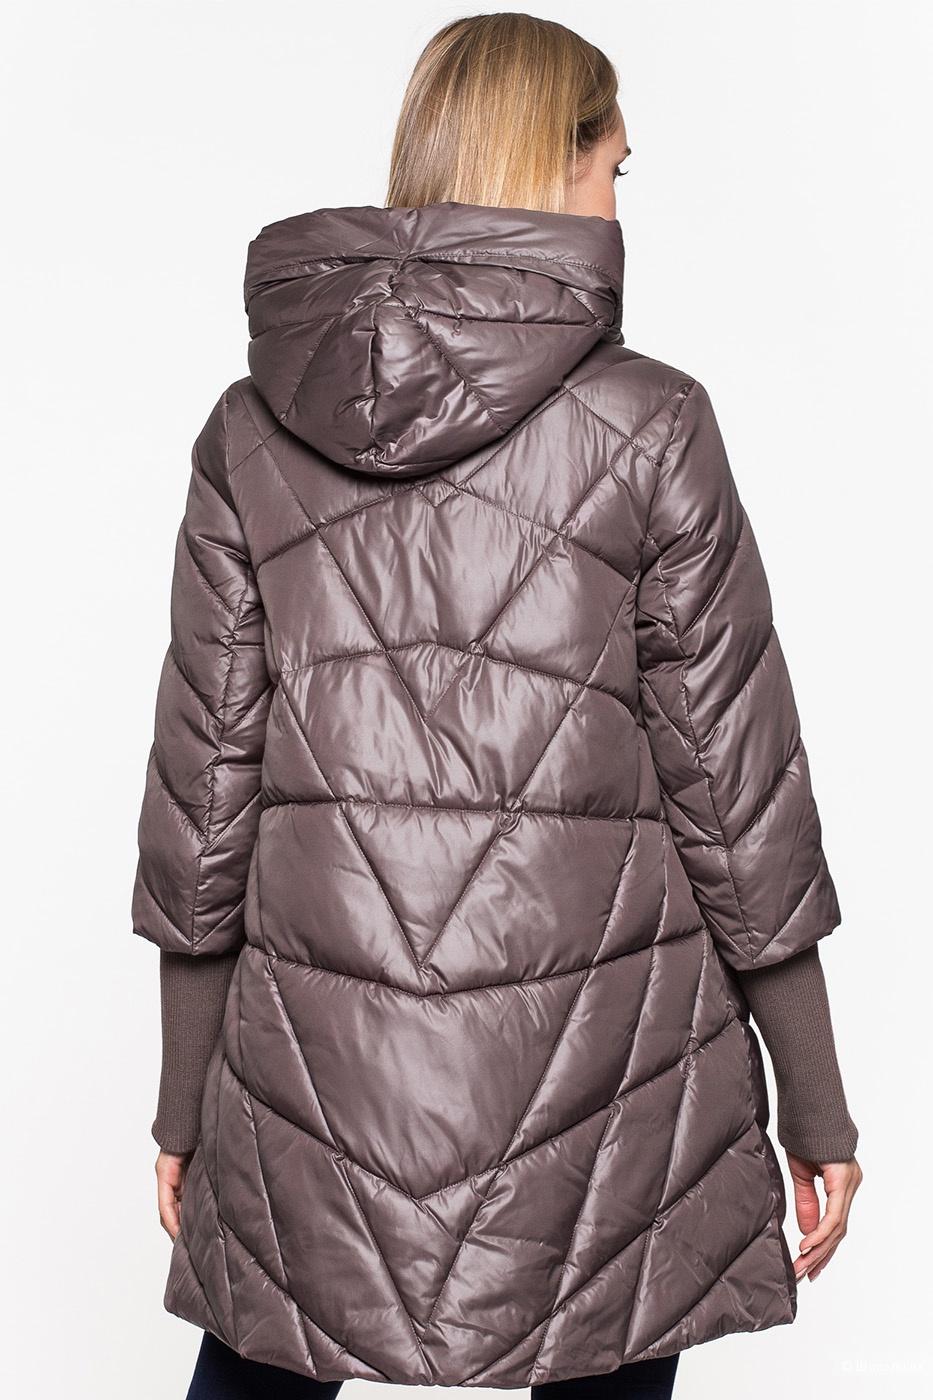 Пуховое пальто Odri, 48 размер